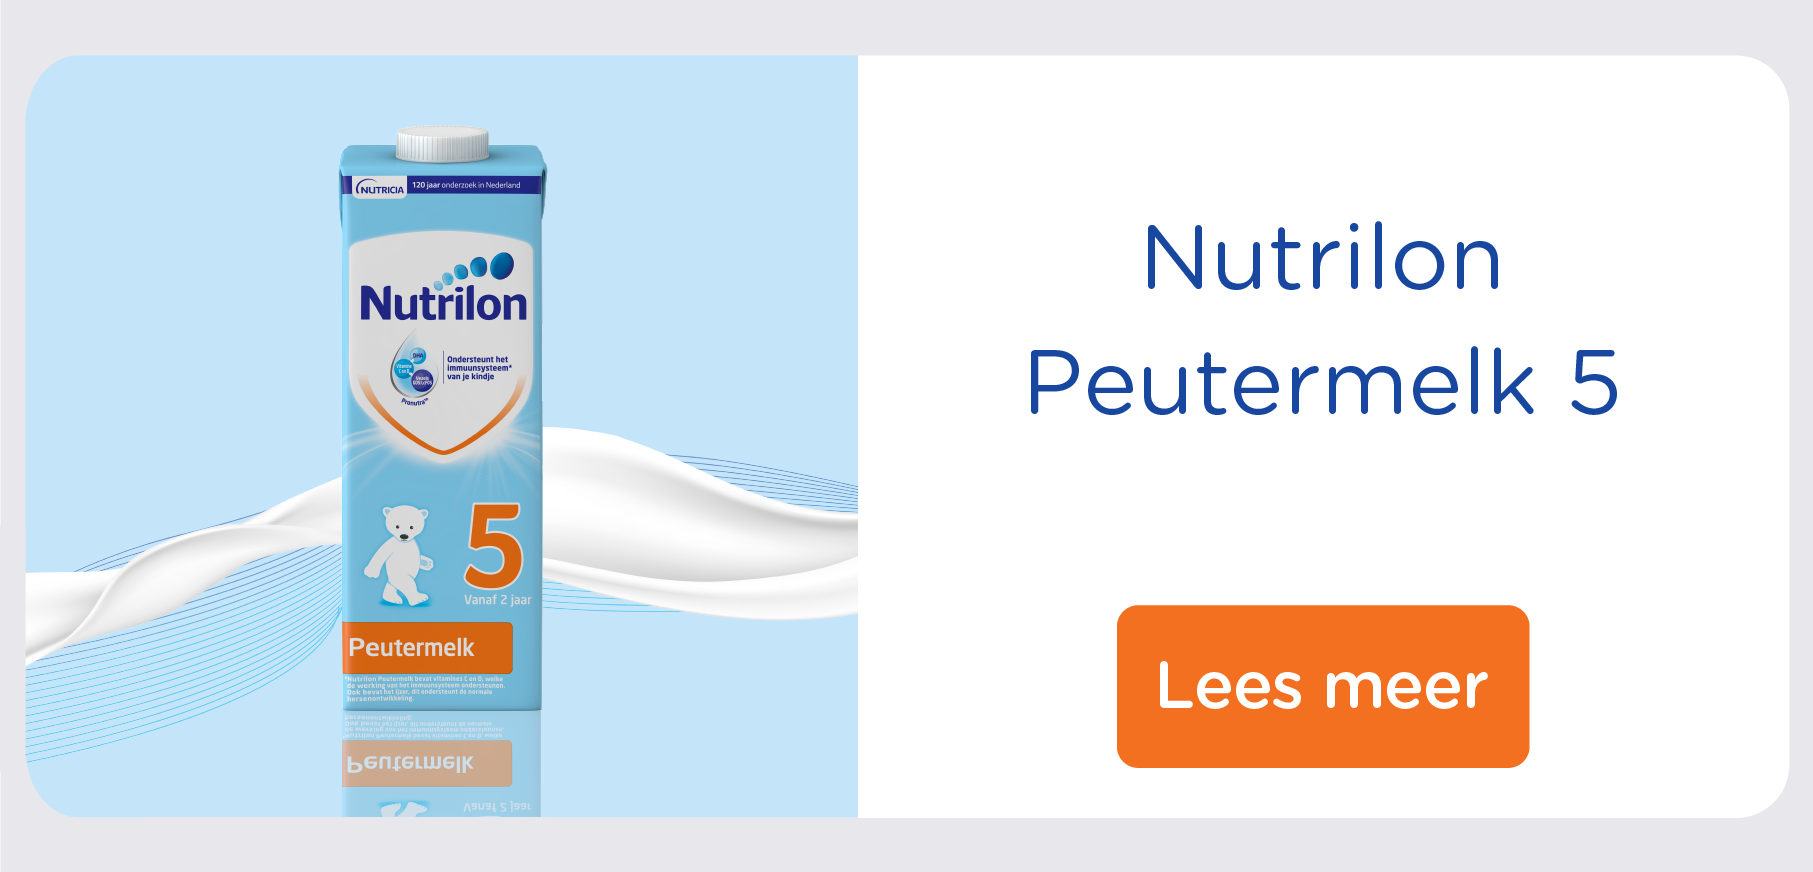 Nutrilon Peutermelk 5 kant en klaar